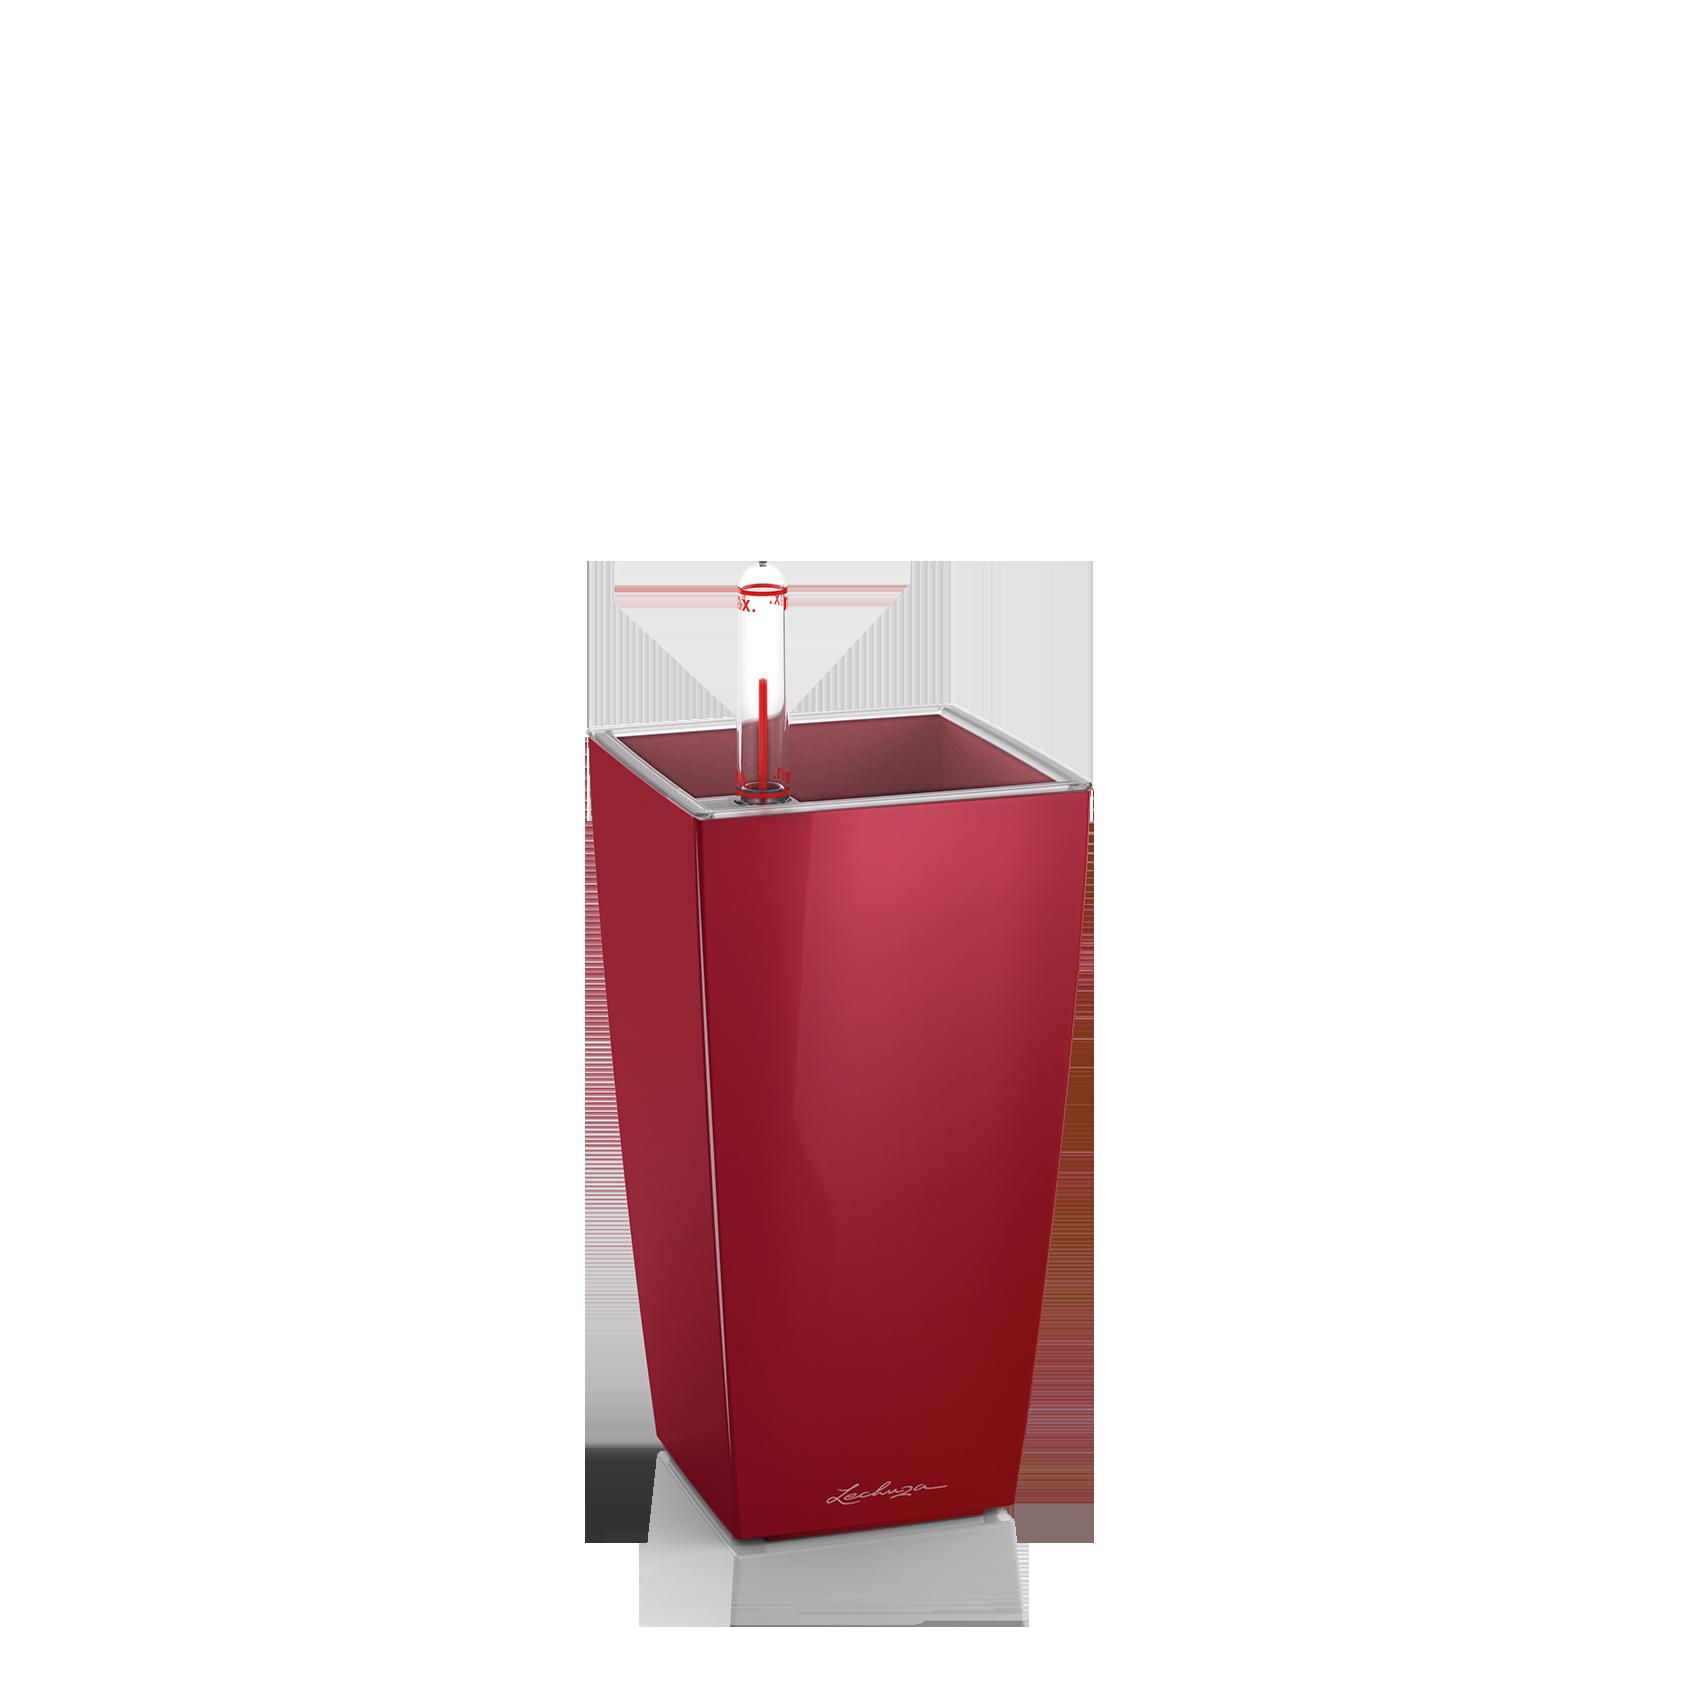 MINI-CUBI rouge scarlet brillant